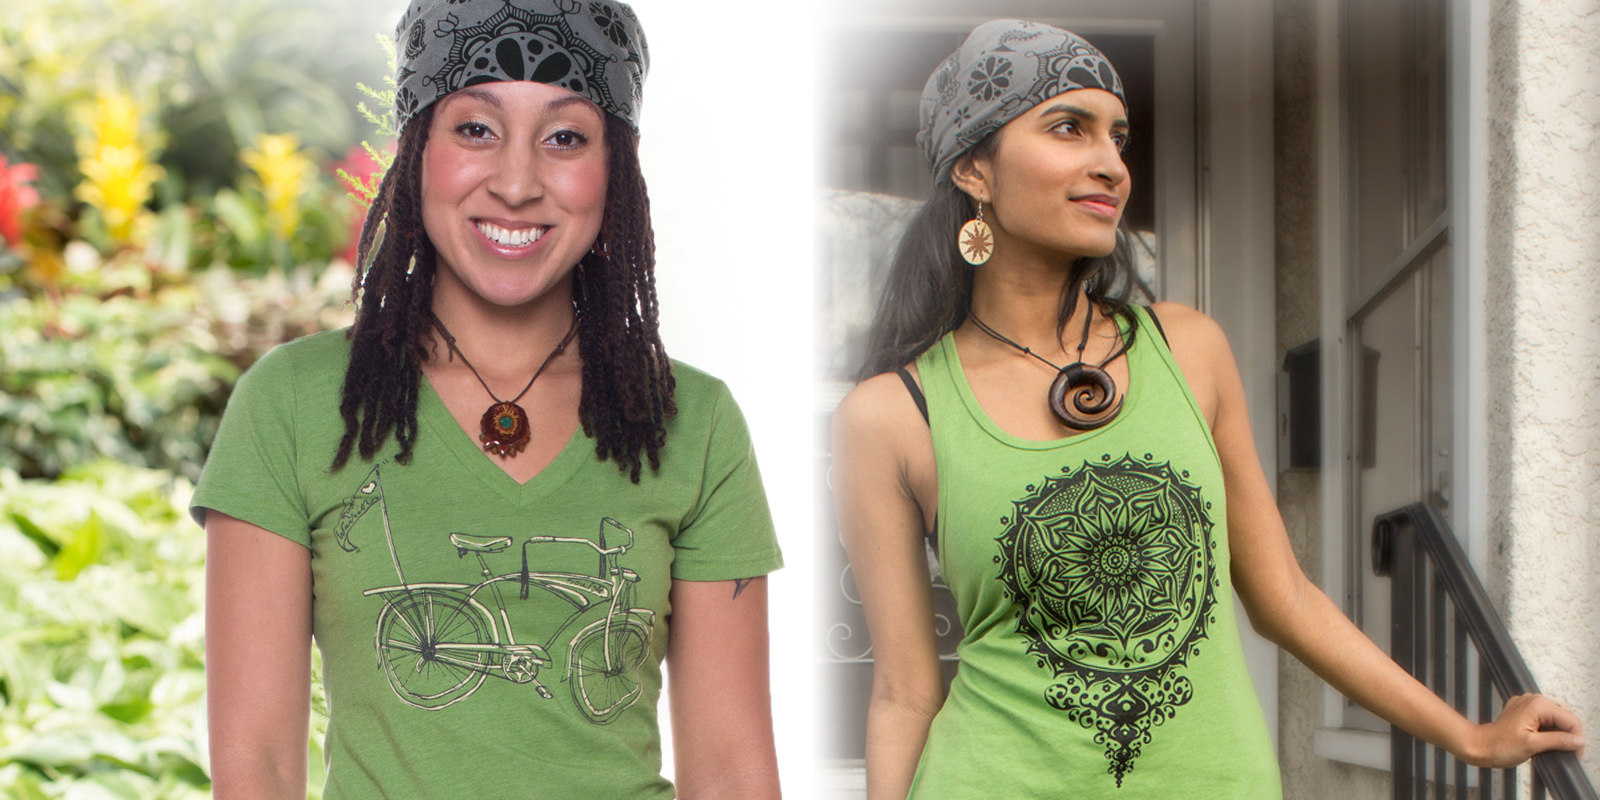 How to Wear a Bandana - The Hippie Wrap